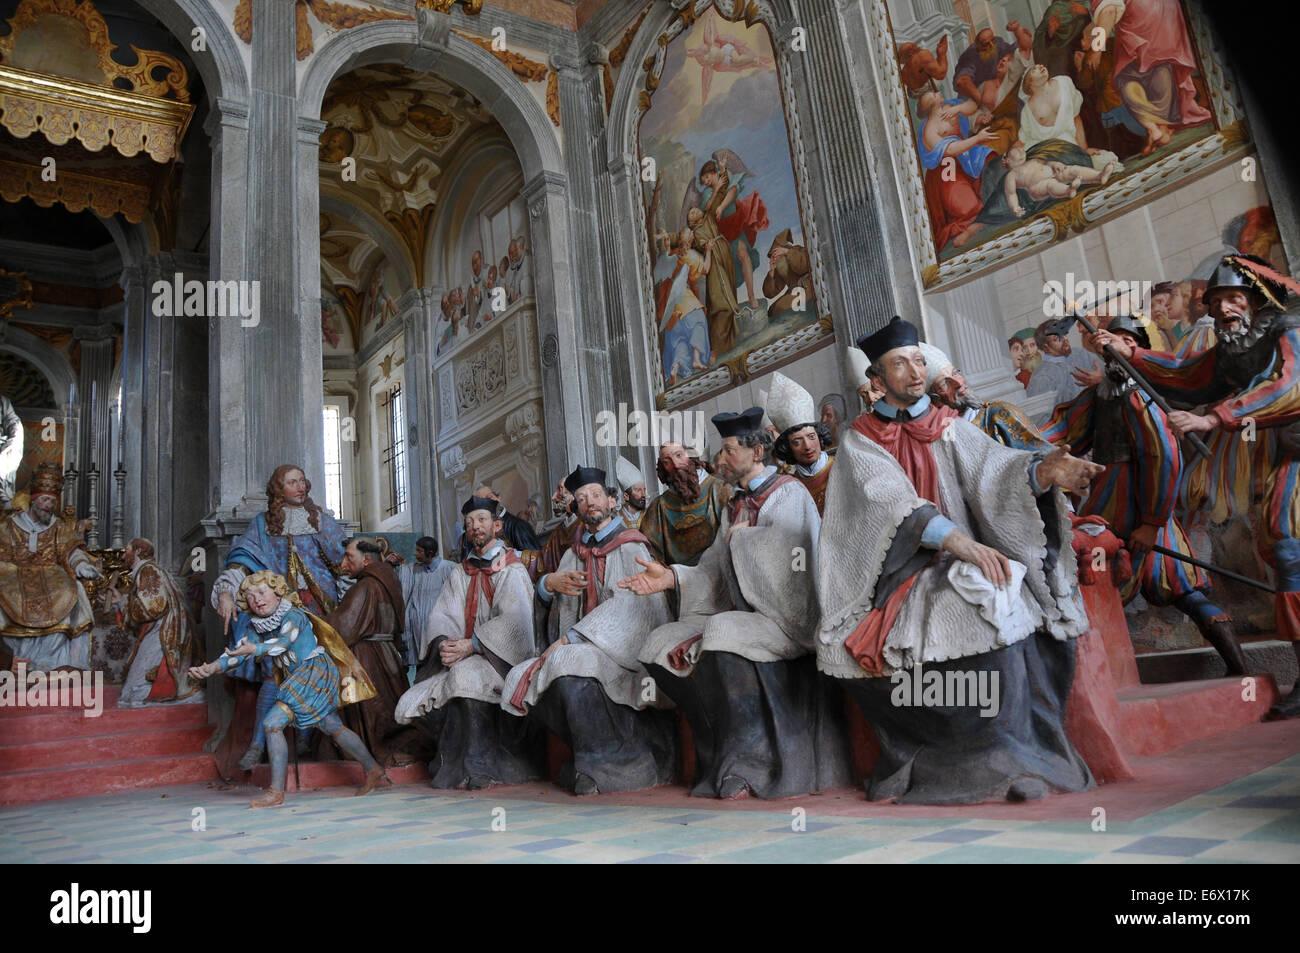 Sacro Monte Dorta Stock Photos & Sacro Monte Dorta Stock Images - Alamy